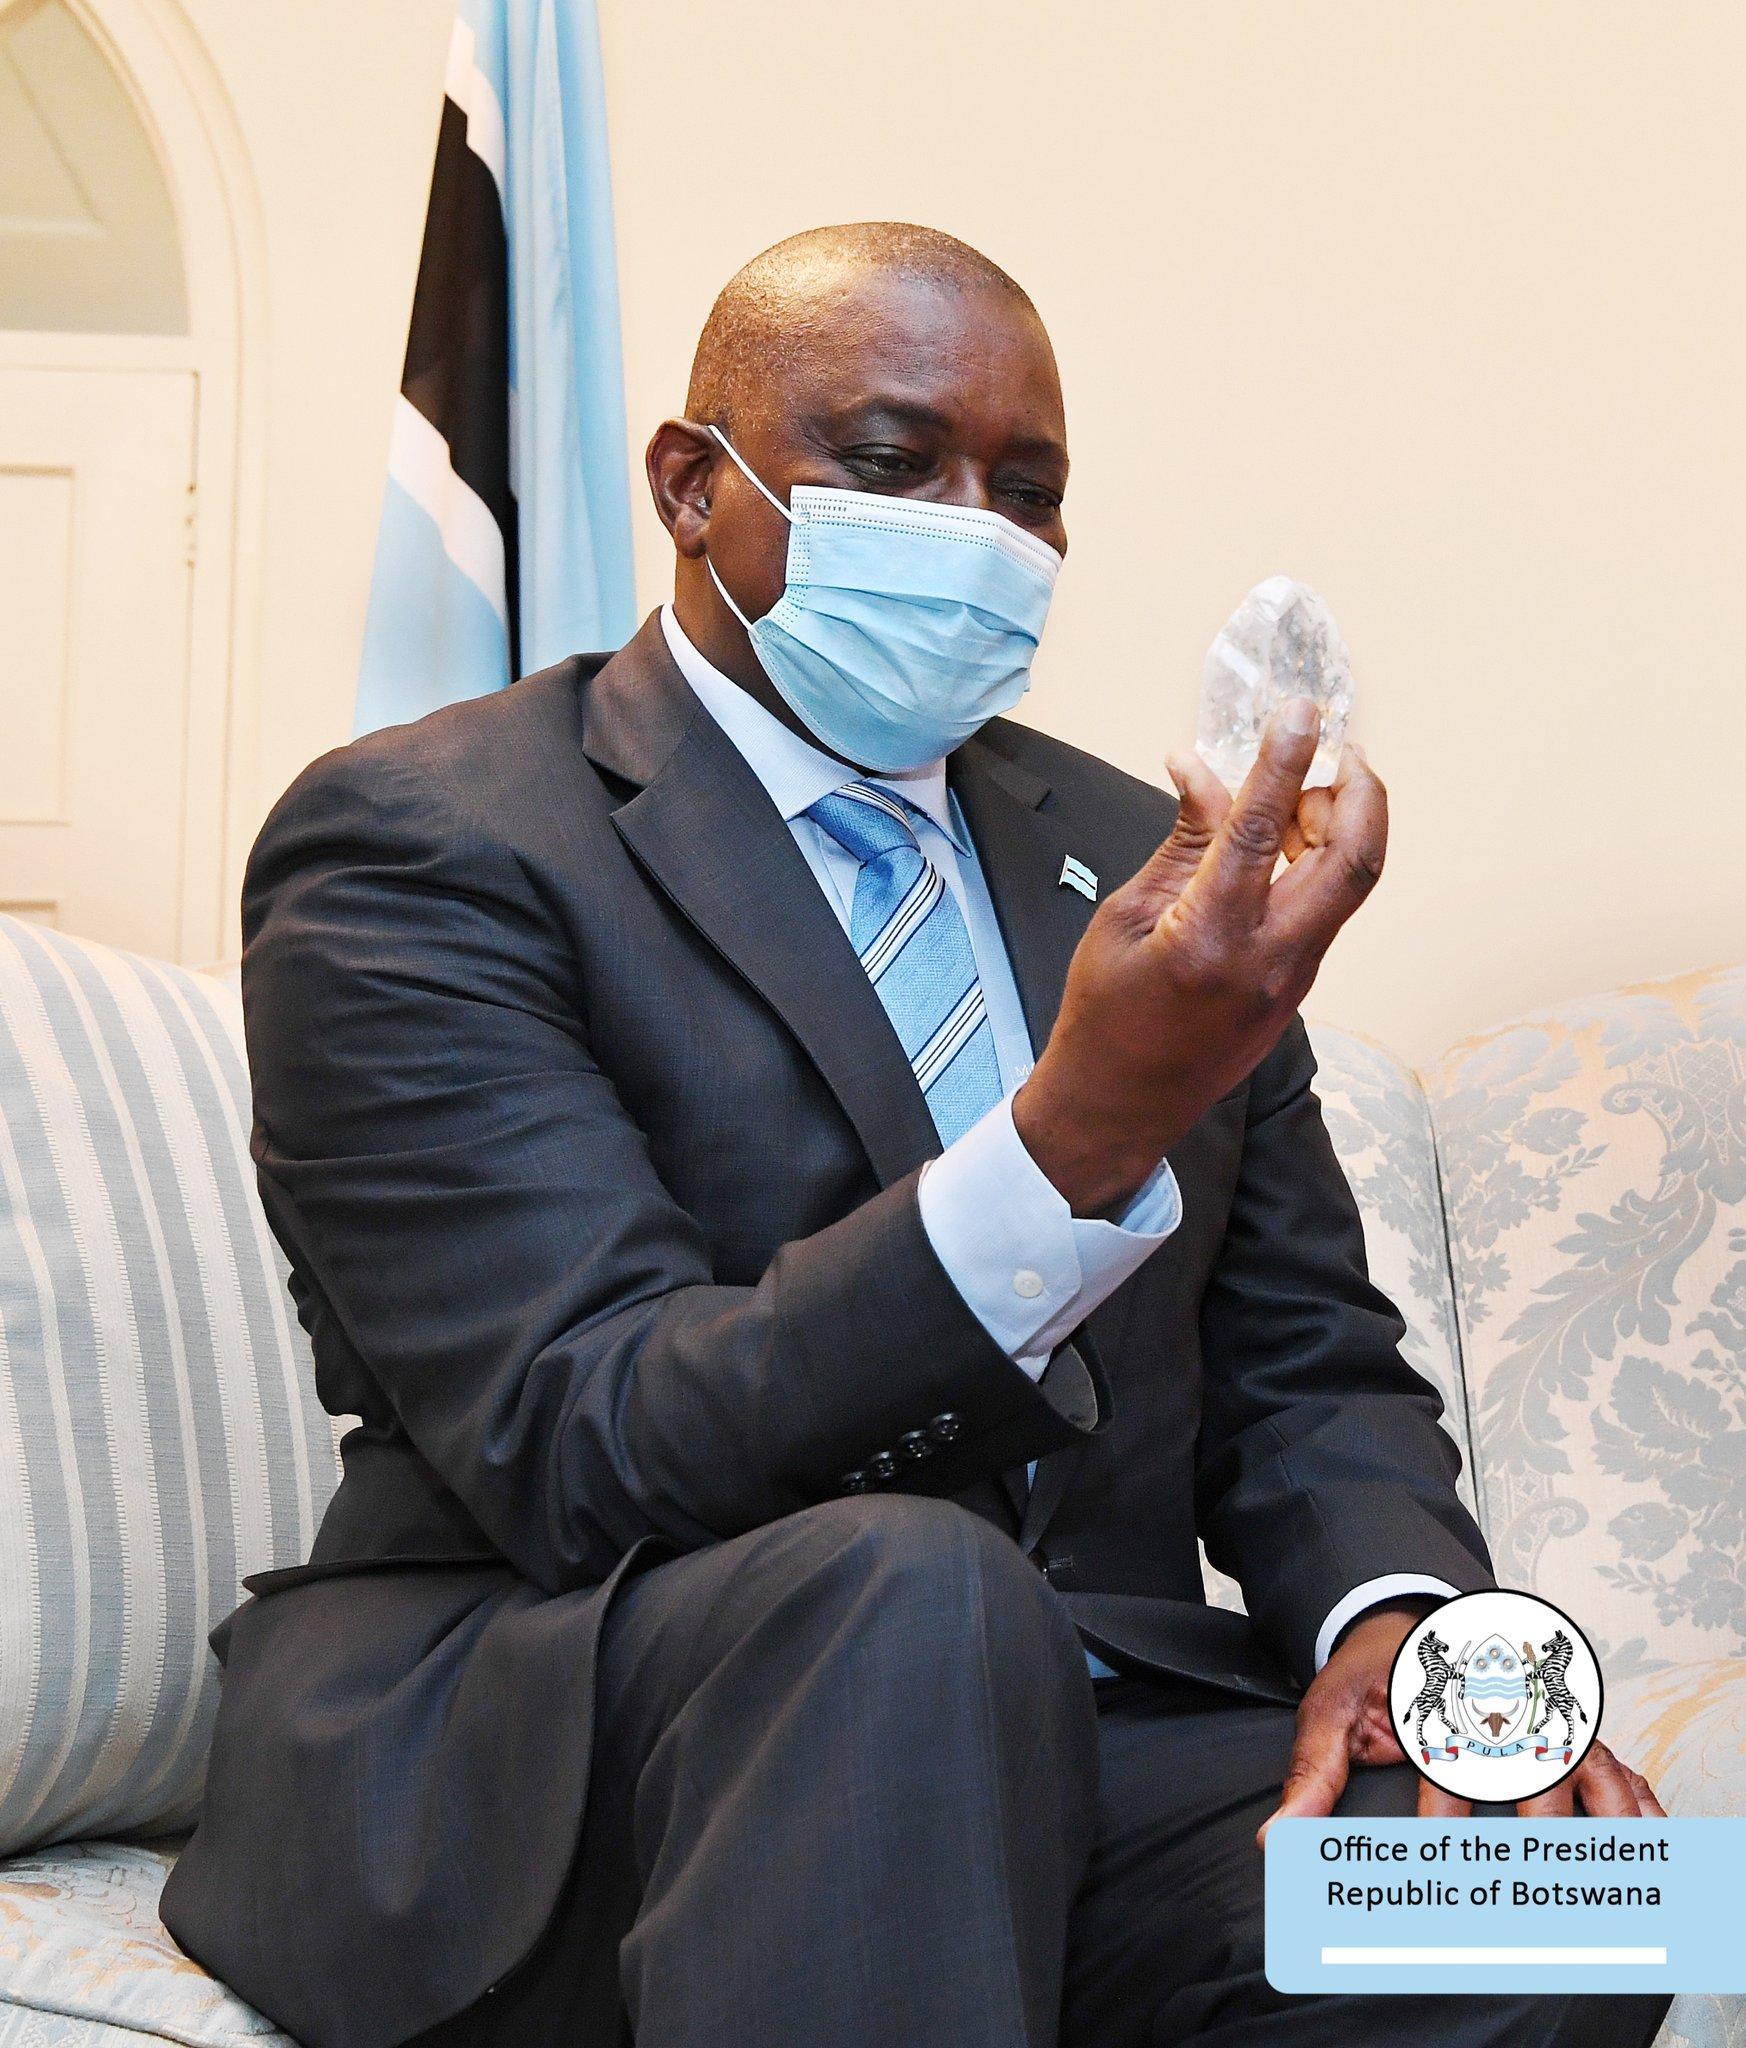 Фото © Twitter / Botswana Government